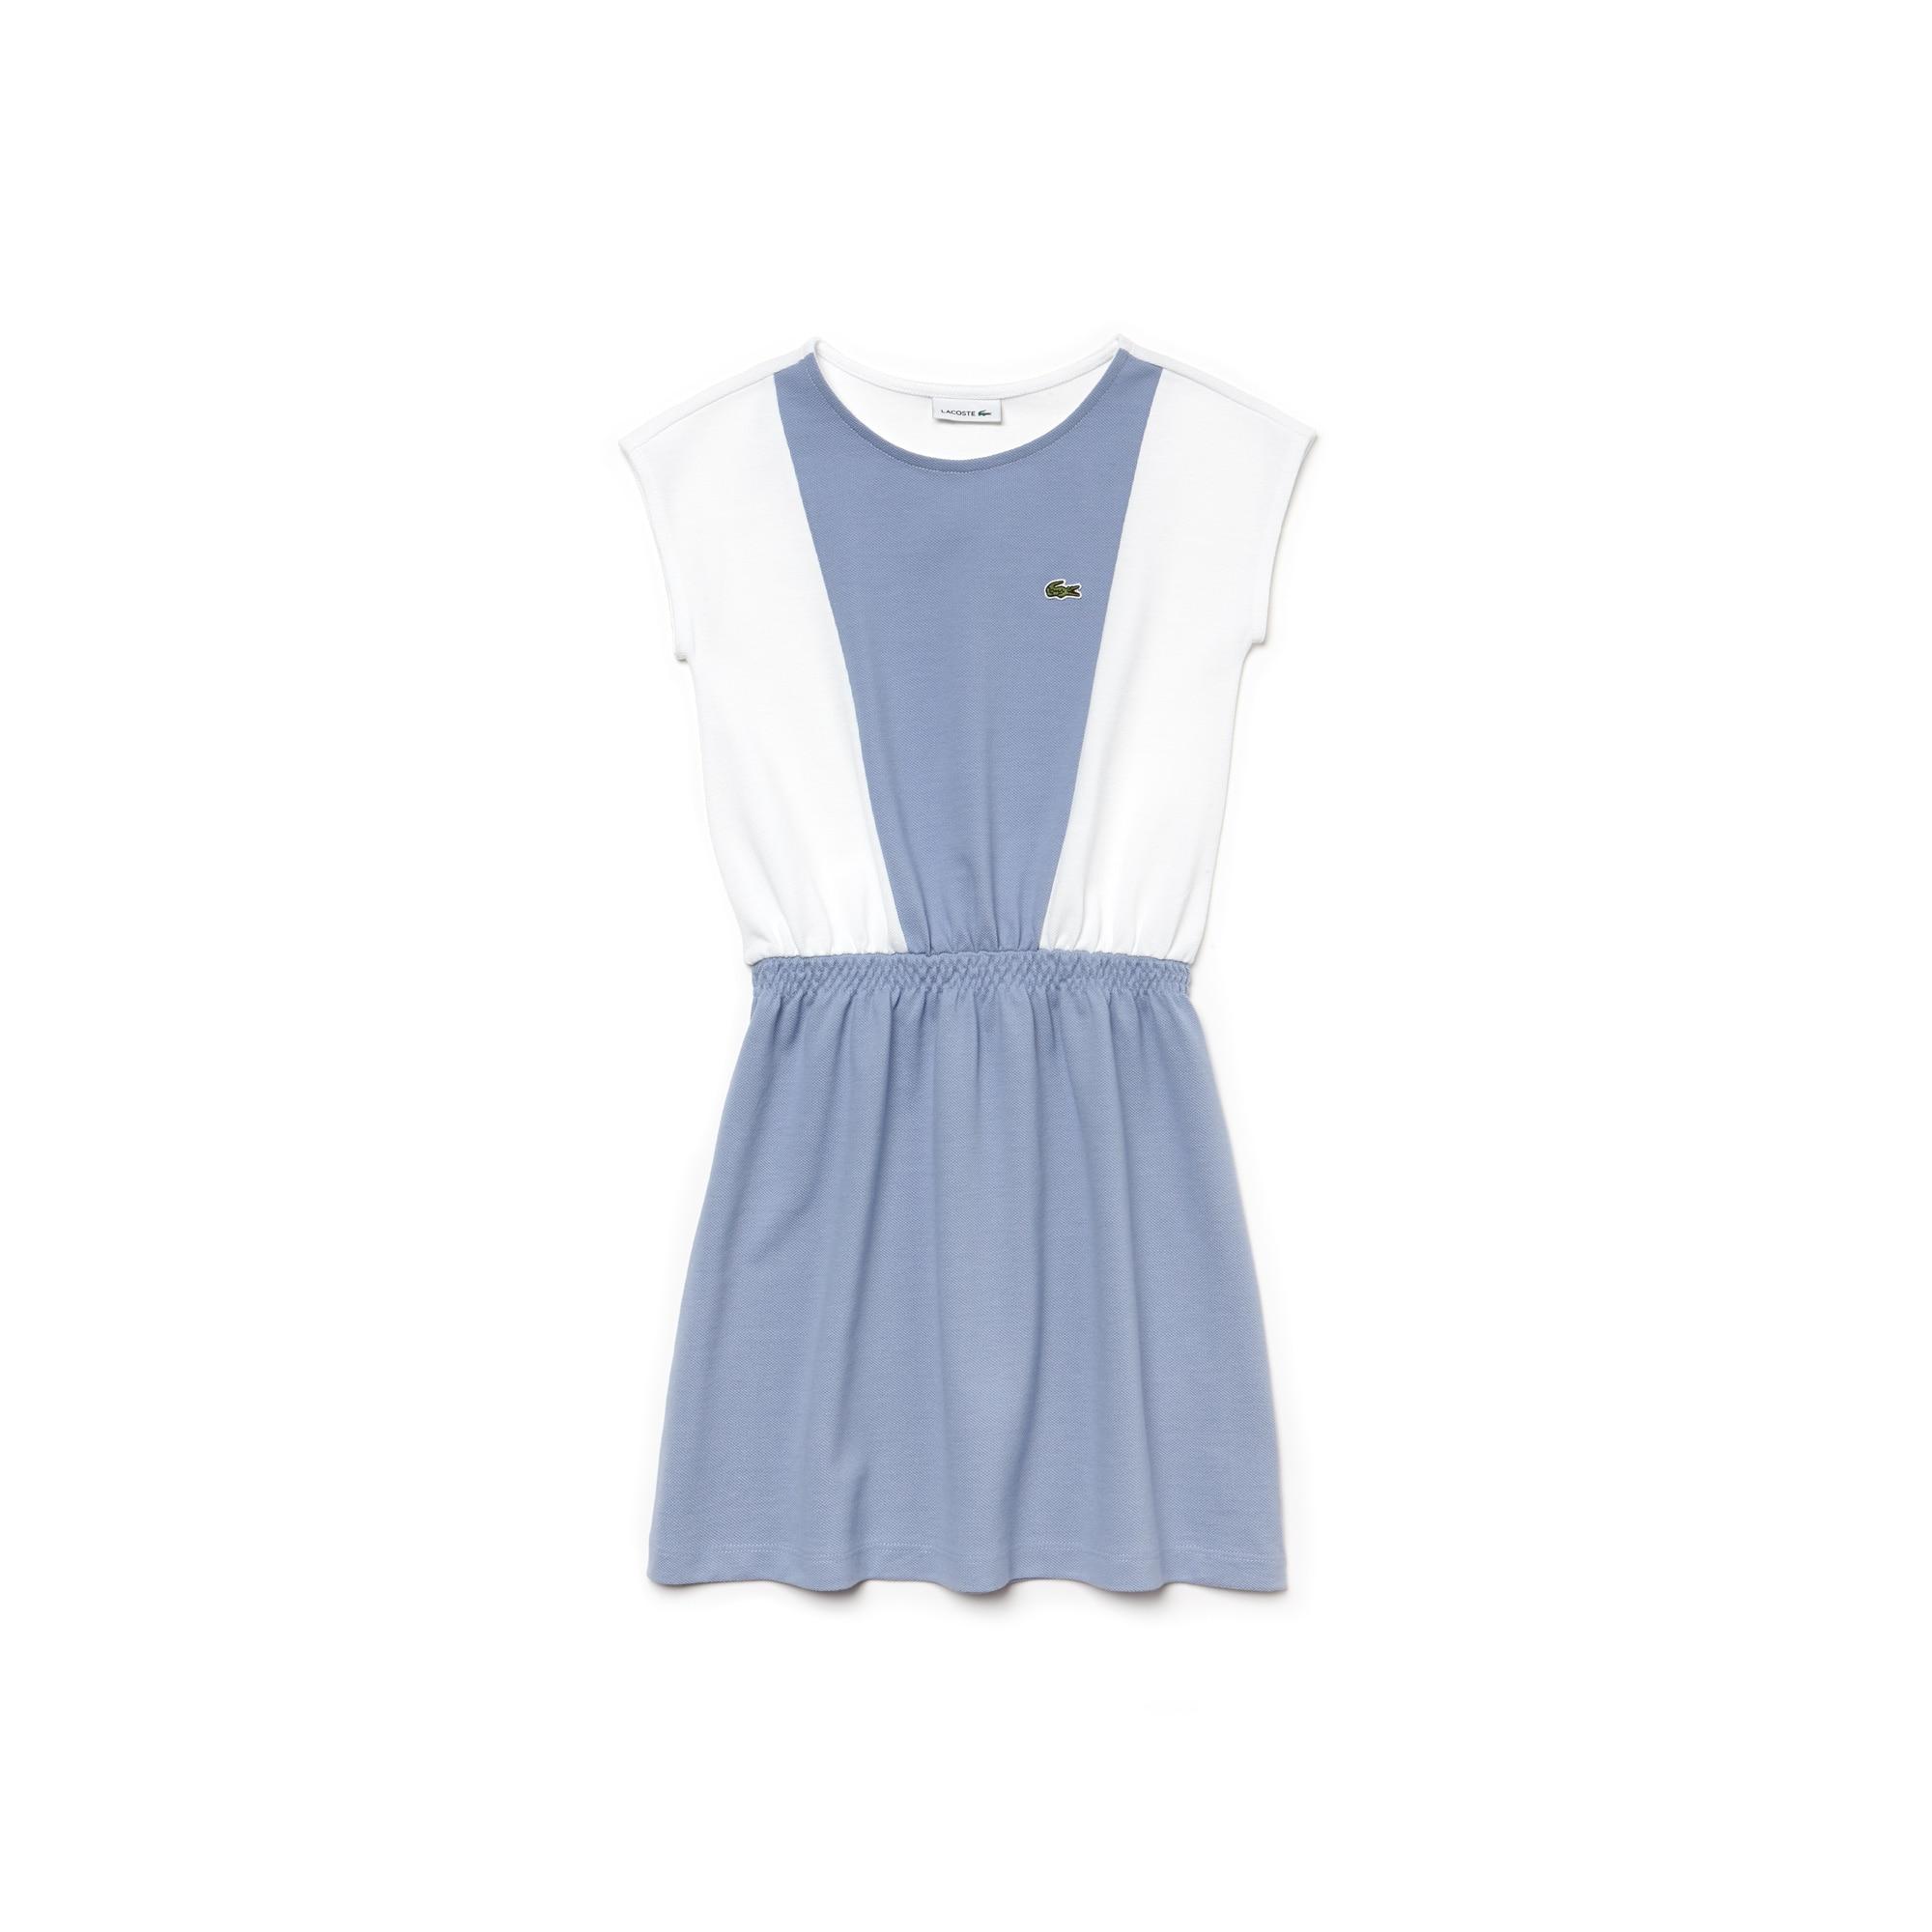 Vestido cintado Menina sem mangas em petit piqué color block